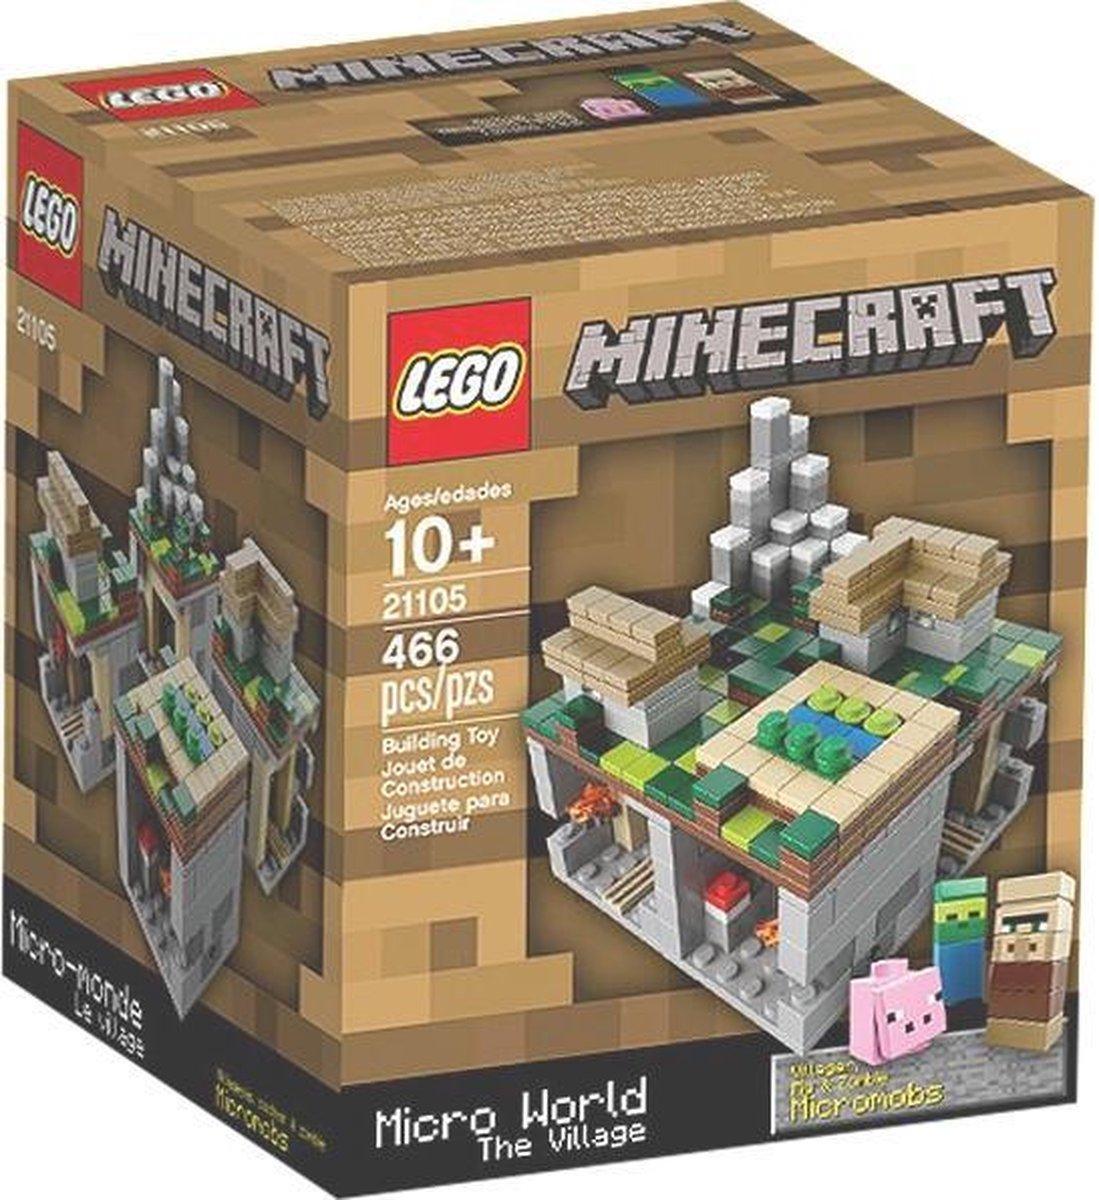 LEGO Minecraft Micro World The Village - 21105